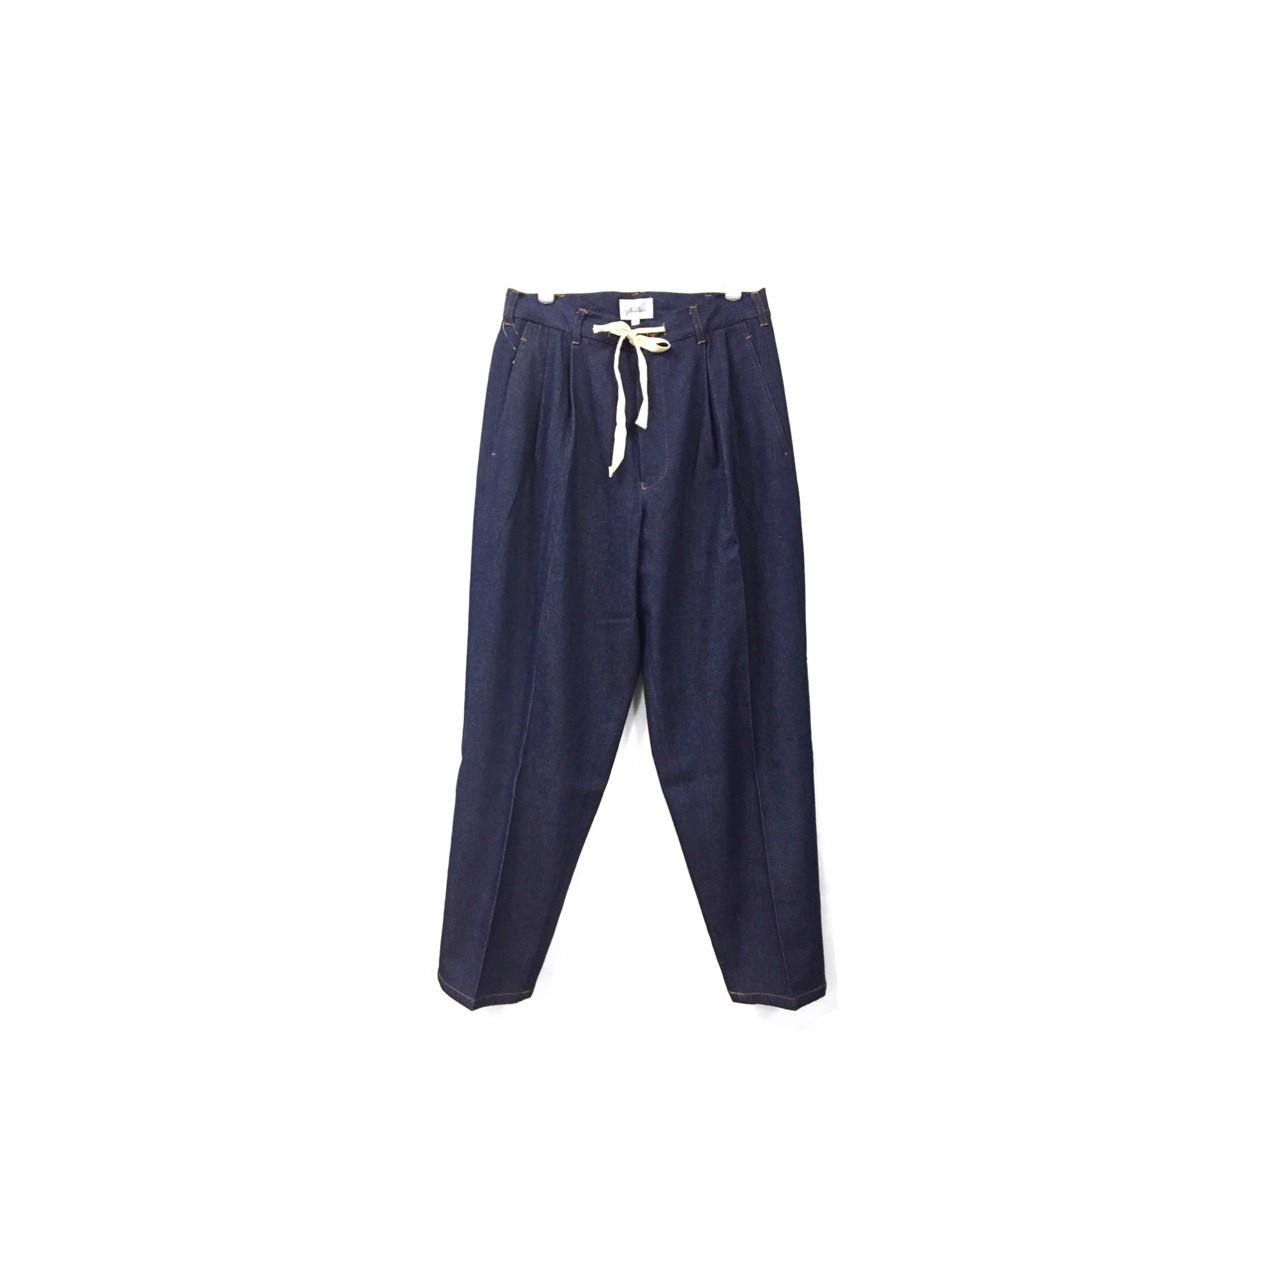 yotsuba - Denim Wide Pants / Indigo ¥23000+tax